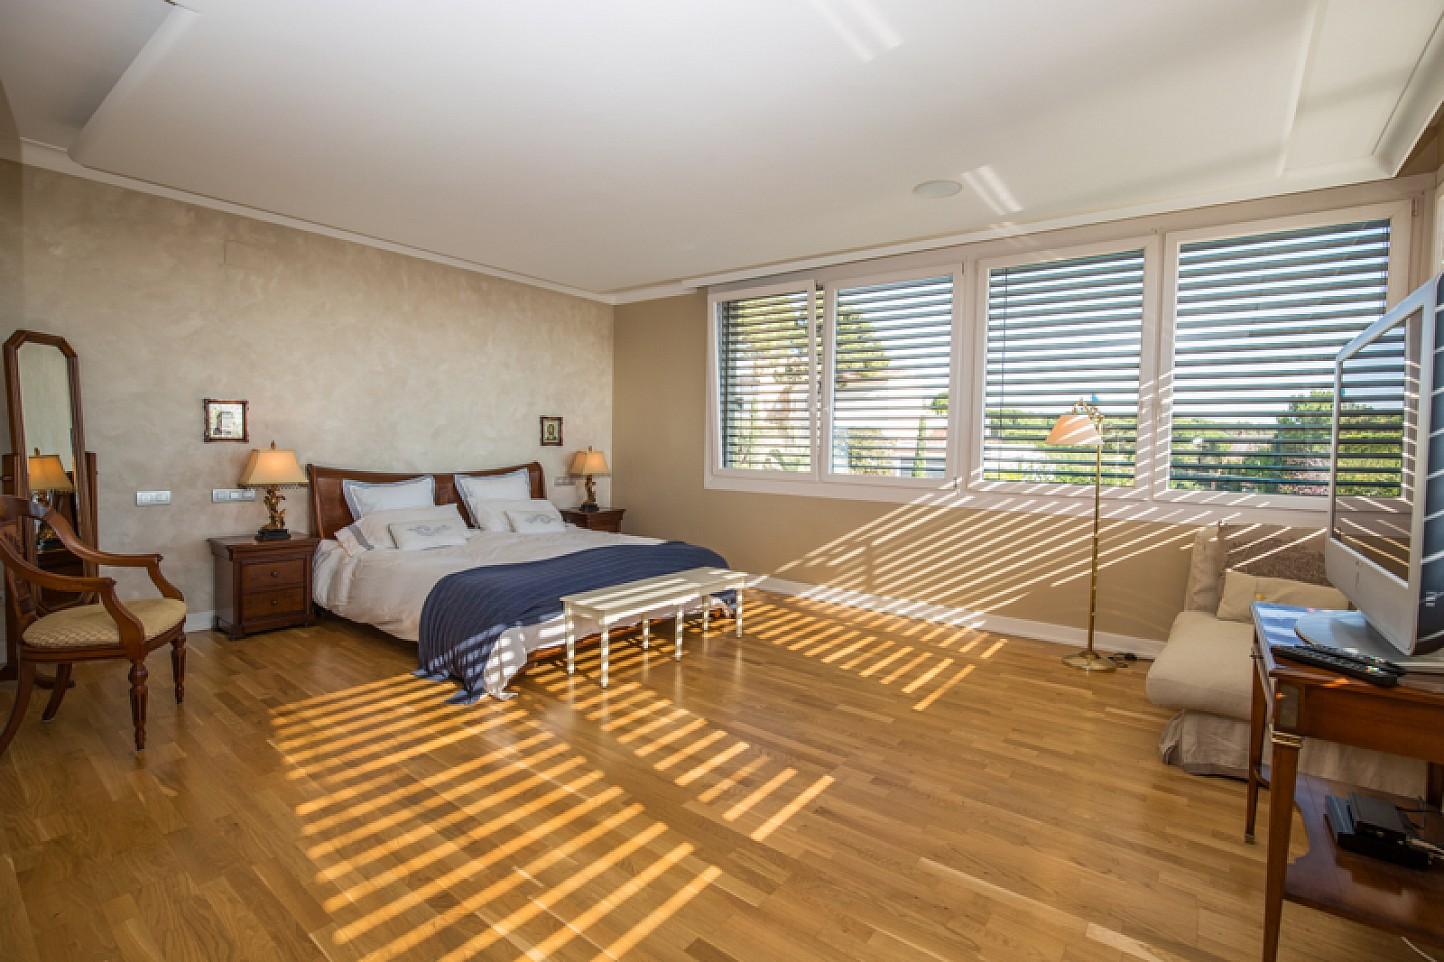 Bedroom in  stylish villa for sale in Lloret de Mar, Costa Brava